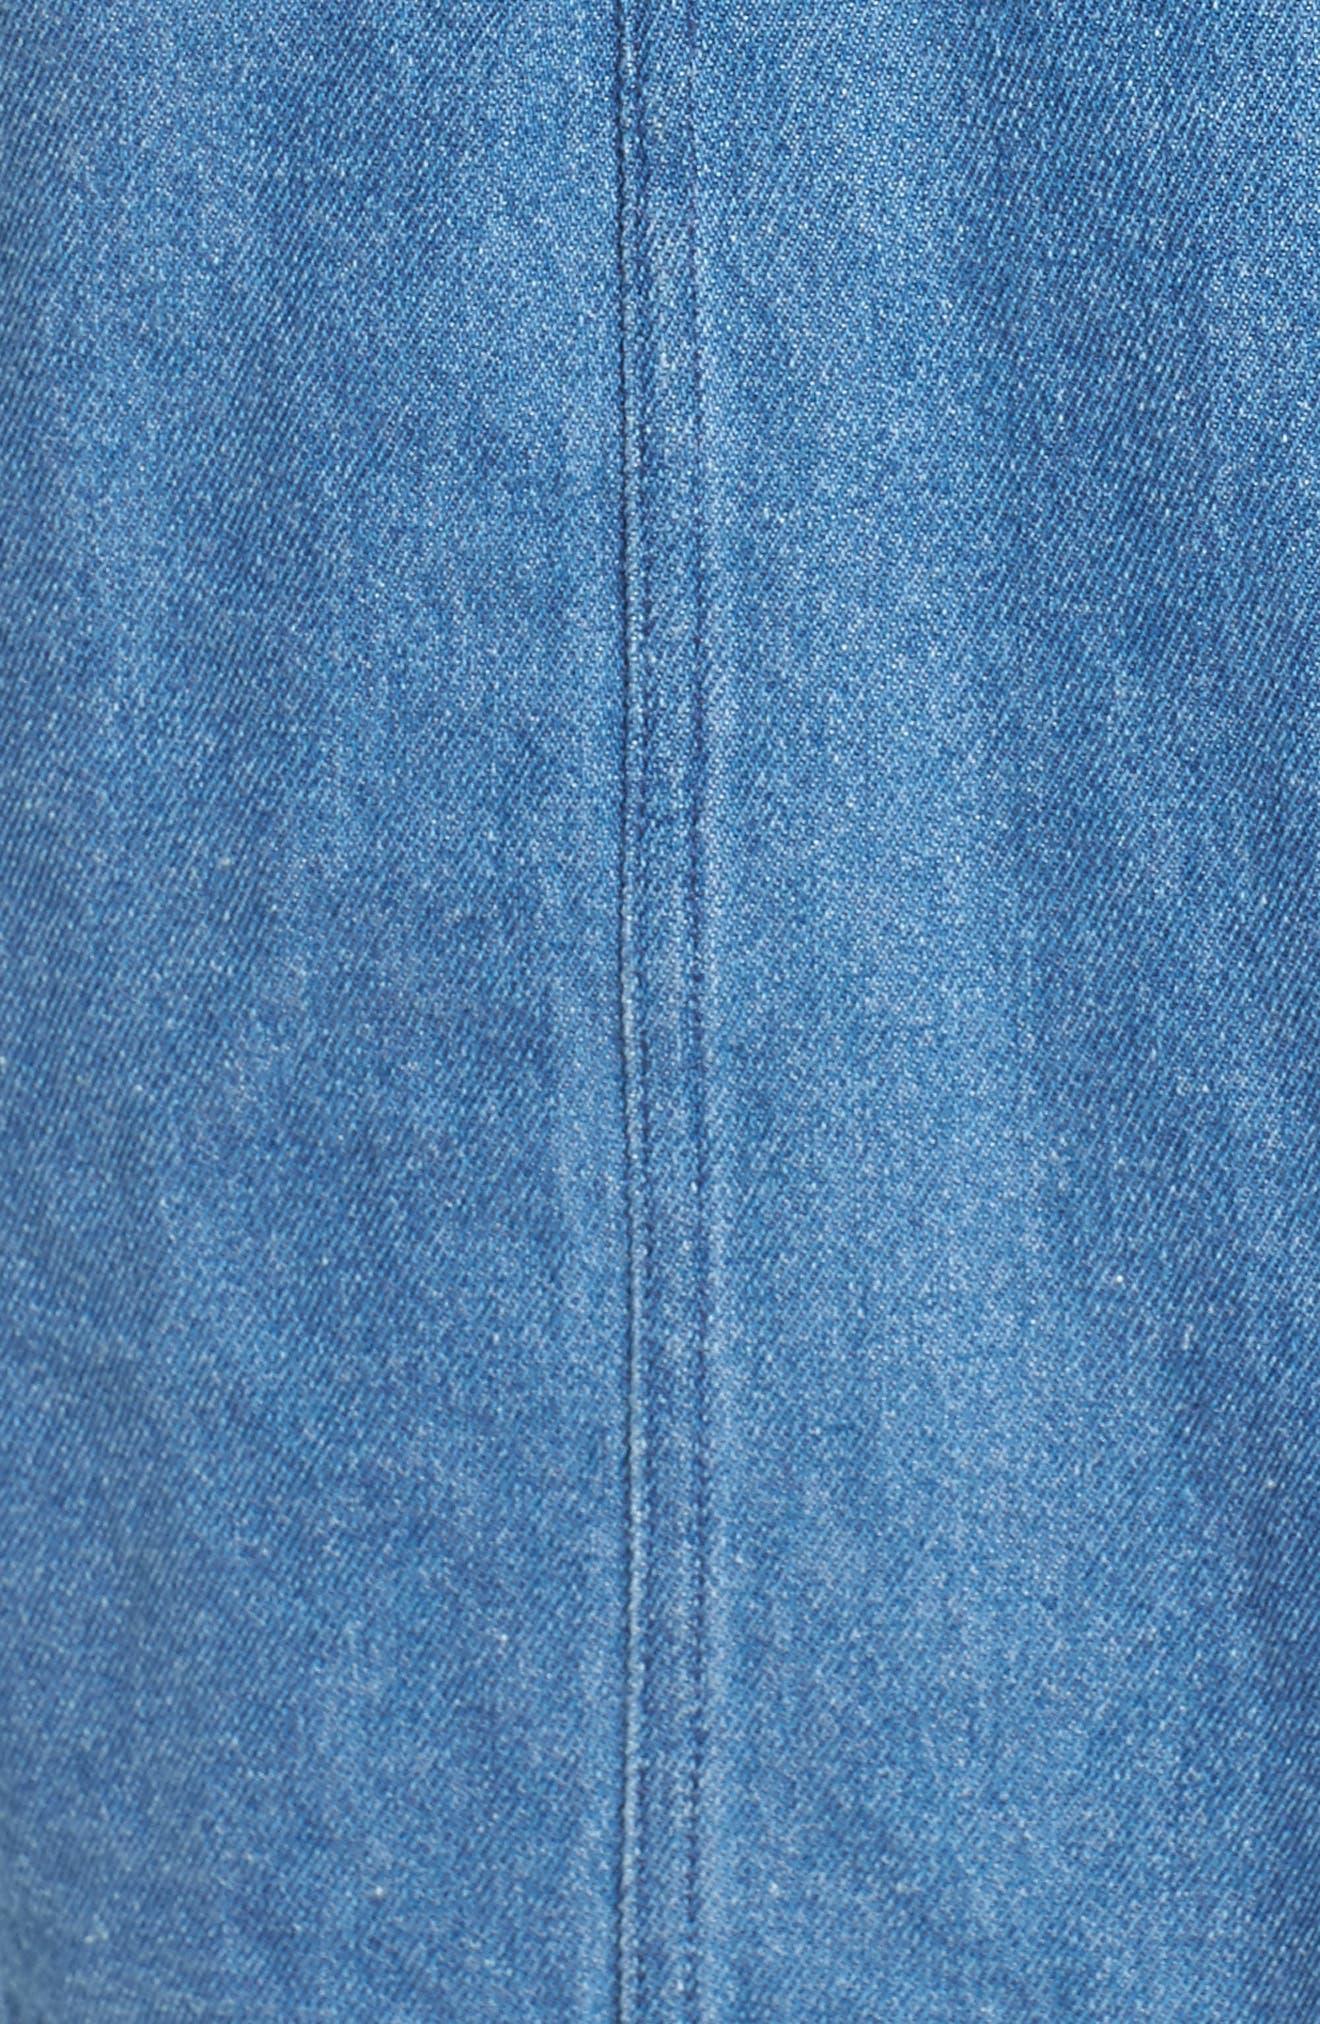 Vagabond Denim Dress,                             Alternate thumbnail 5, color,                             400